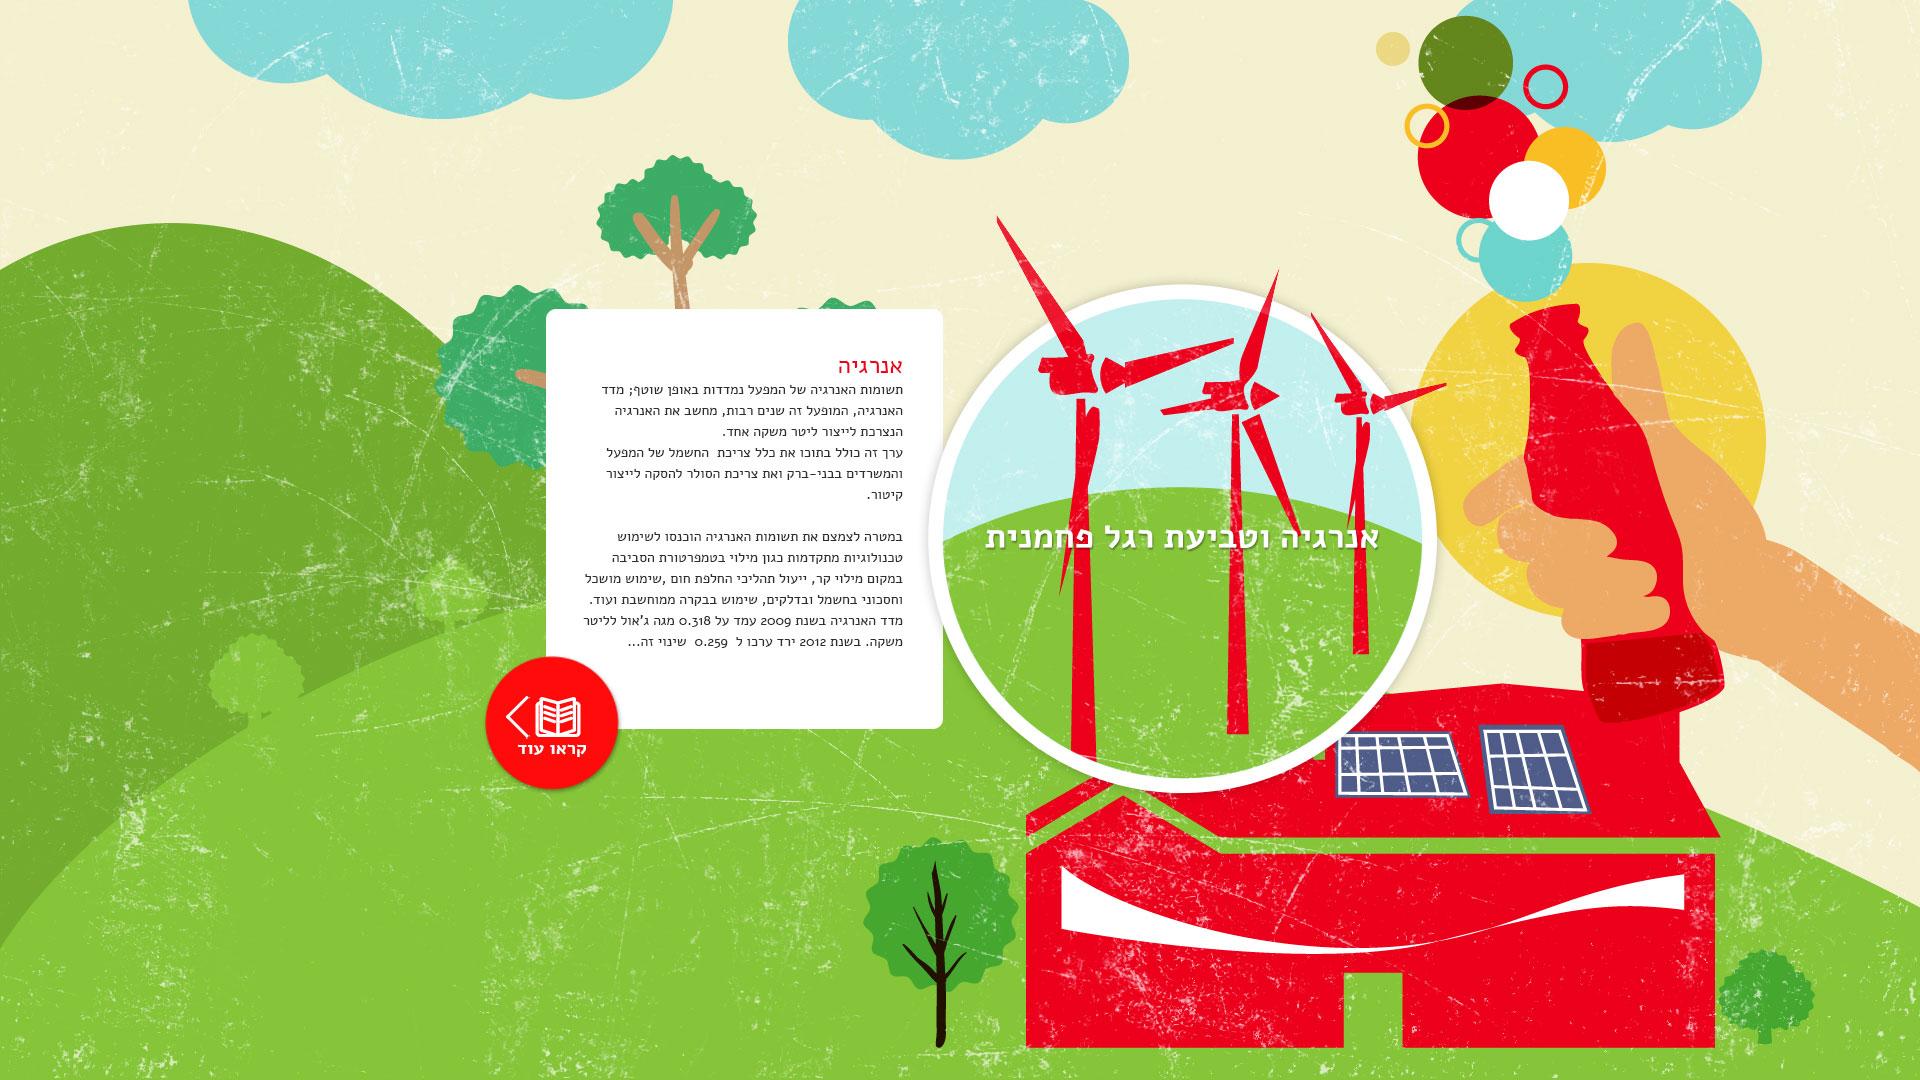 Coca Cola social responsibility website design קוקה קולה עיצוב אתר אחריות חברתית 5